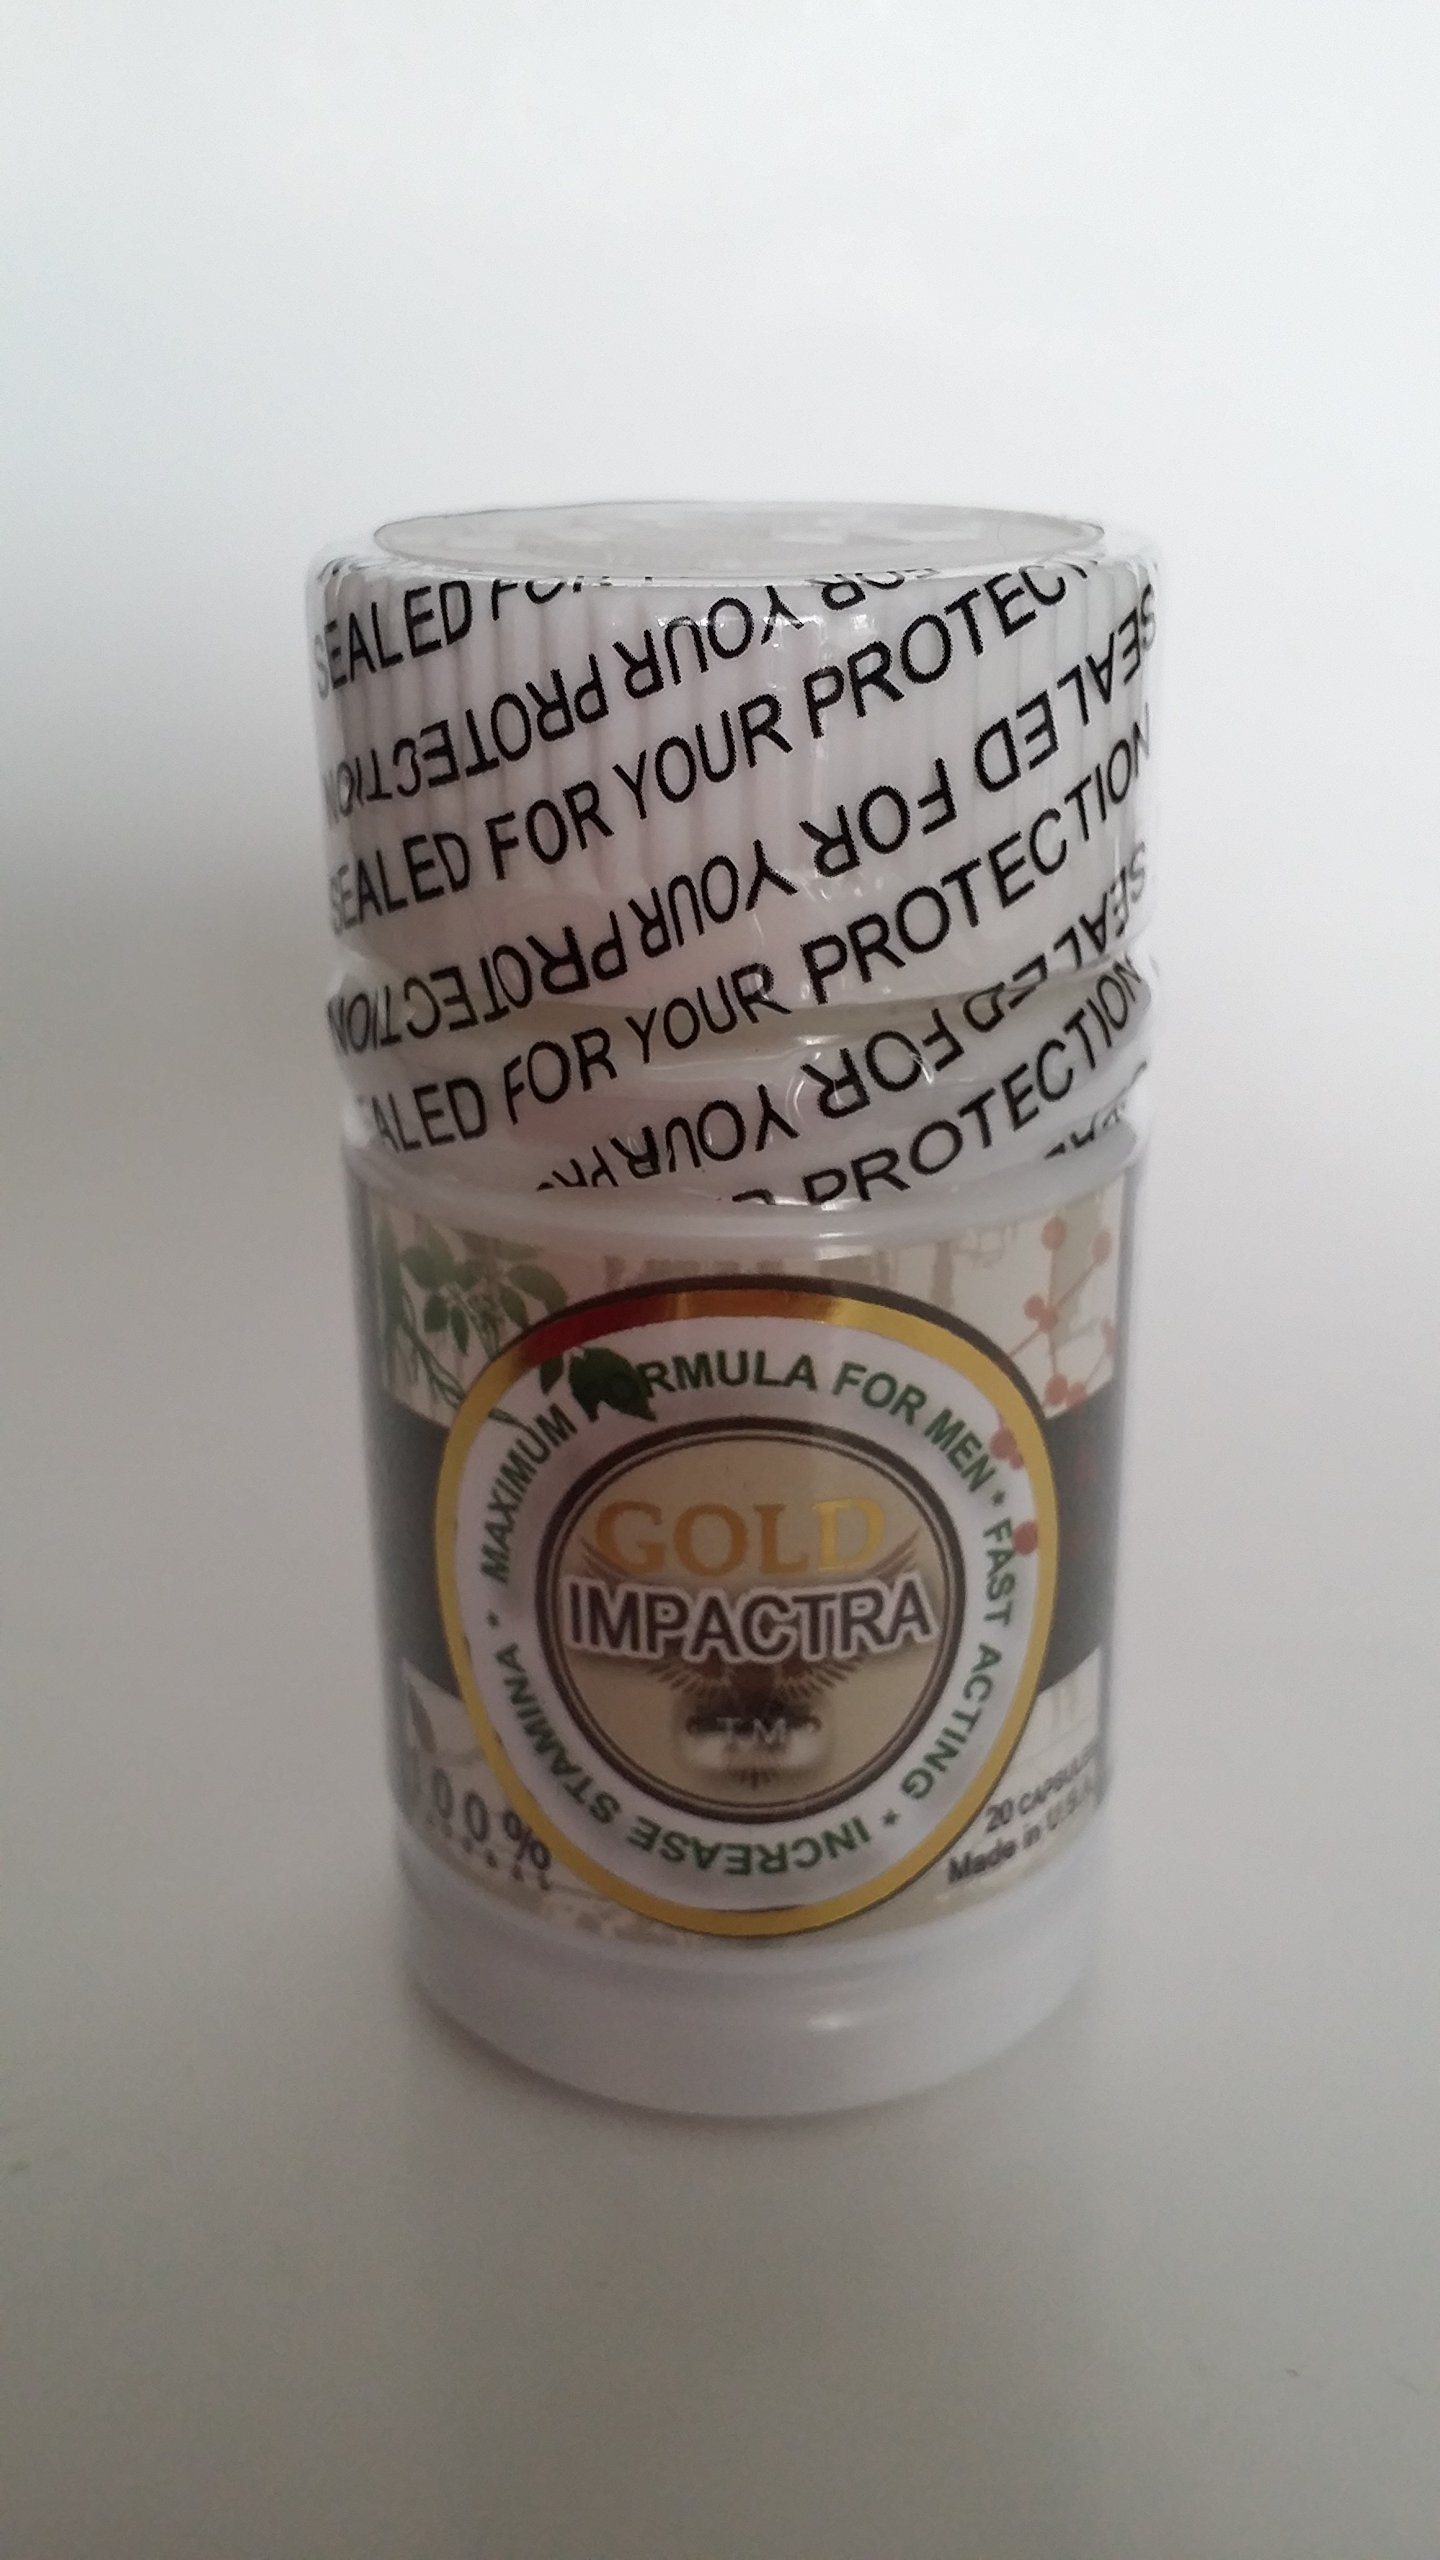 Gold Impactra Increase stamina Herbal 100% Natural